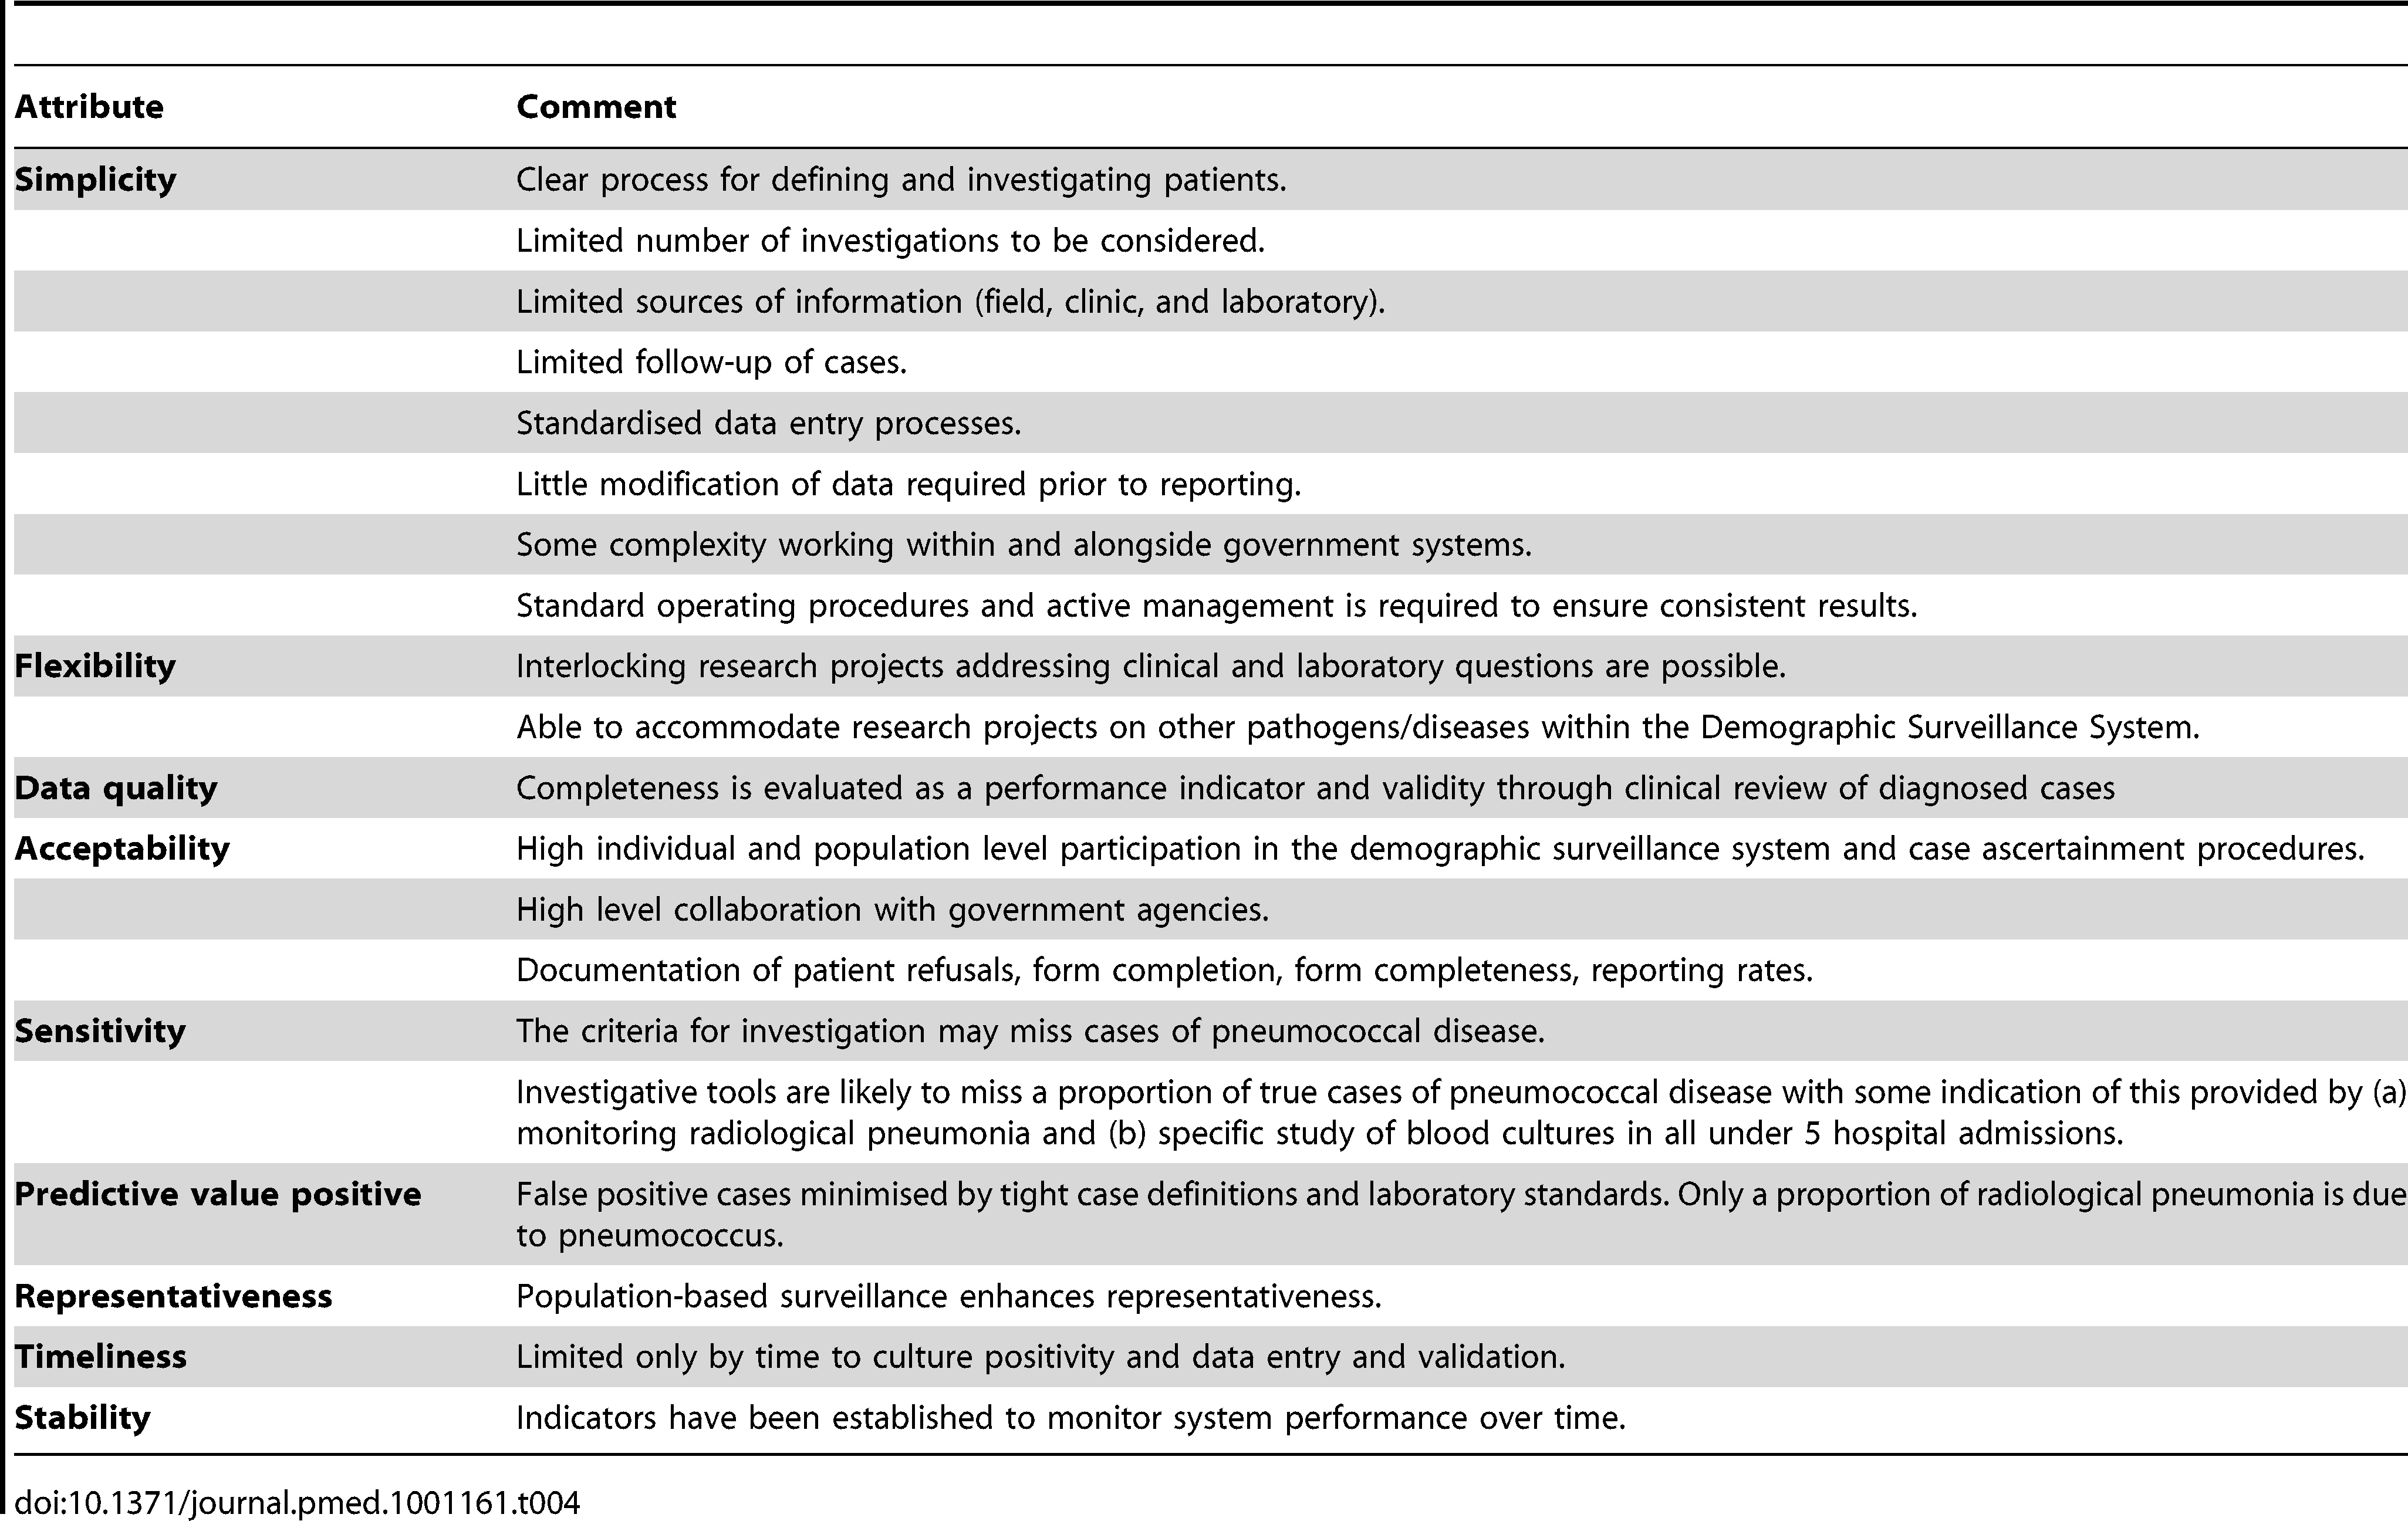 Pneumococcal surveillance system attributes.